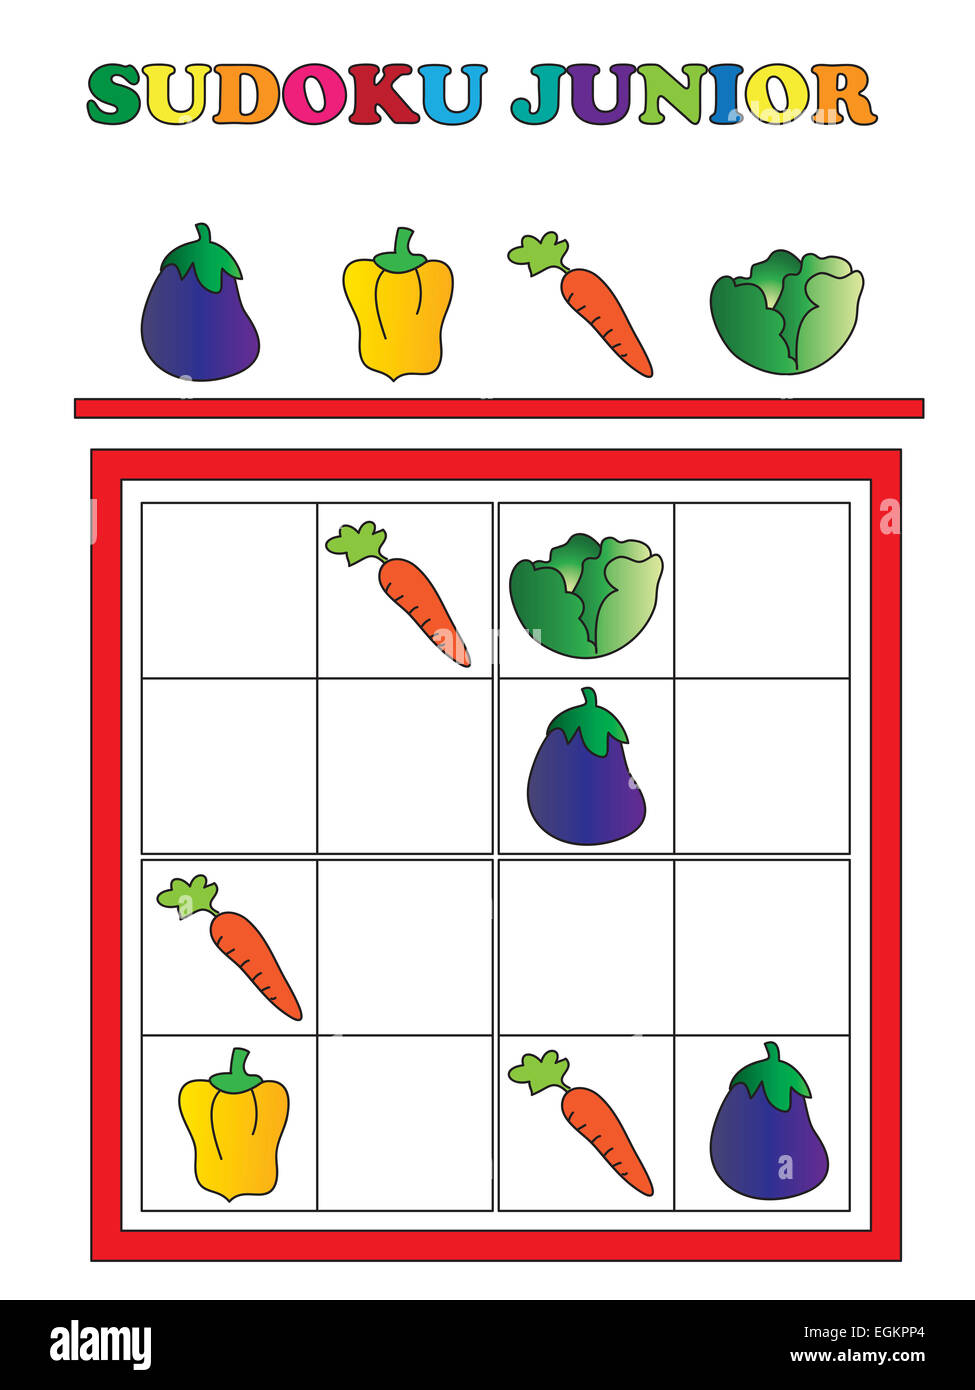 Spiel für Kinder: Sudoku Junior Stockfoto, Bild: 79110924 - Alamy